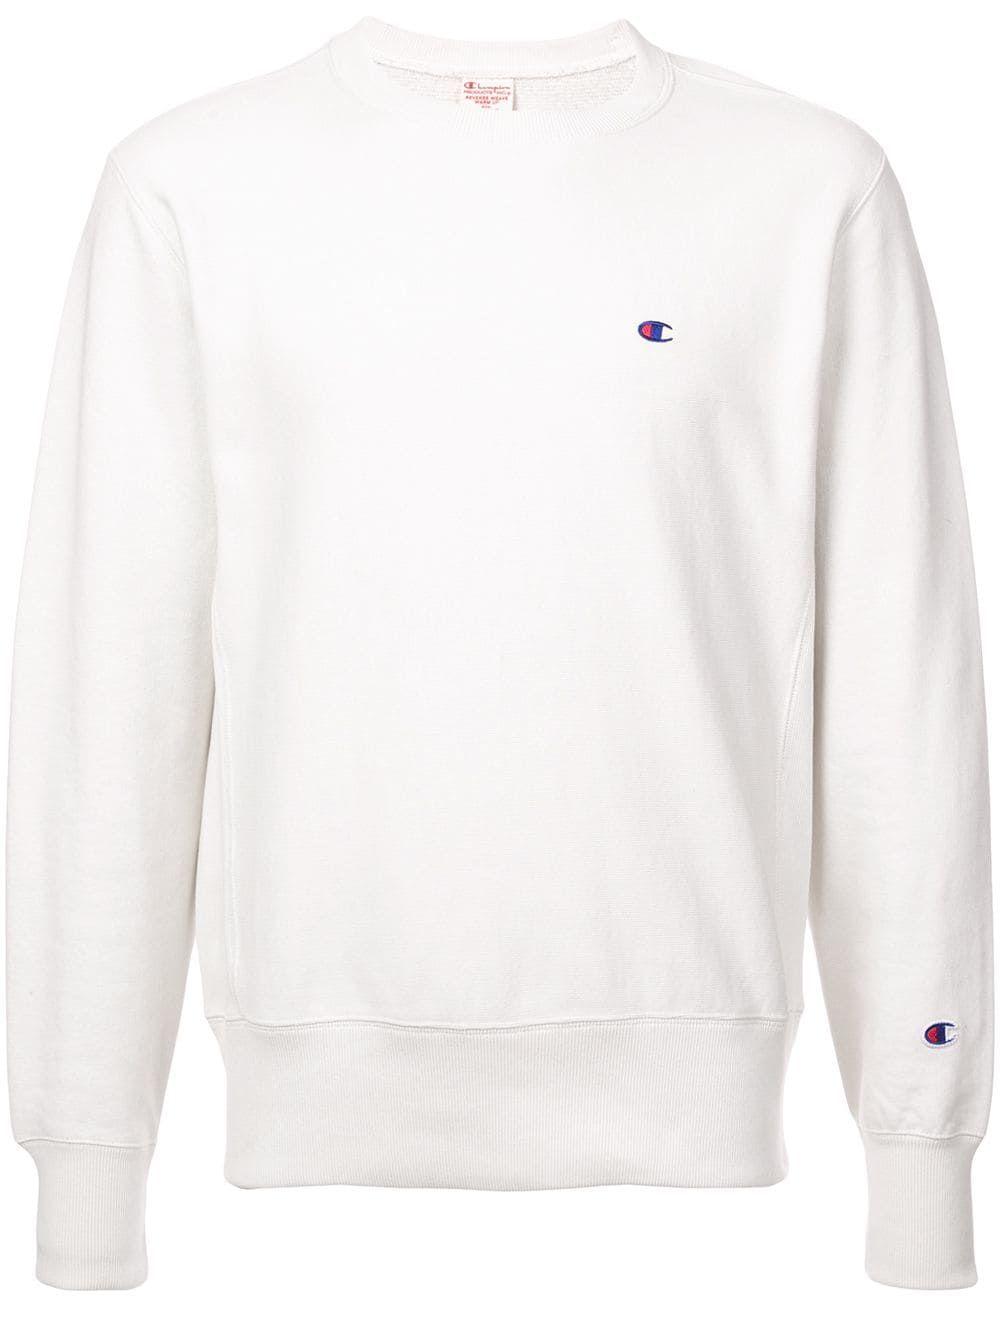 Champion Champion Small Logo Sweatshirt White Champion Cloth [ 1334 x 1000 Pixel ]